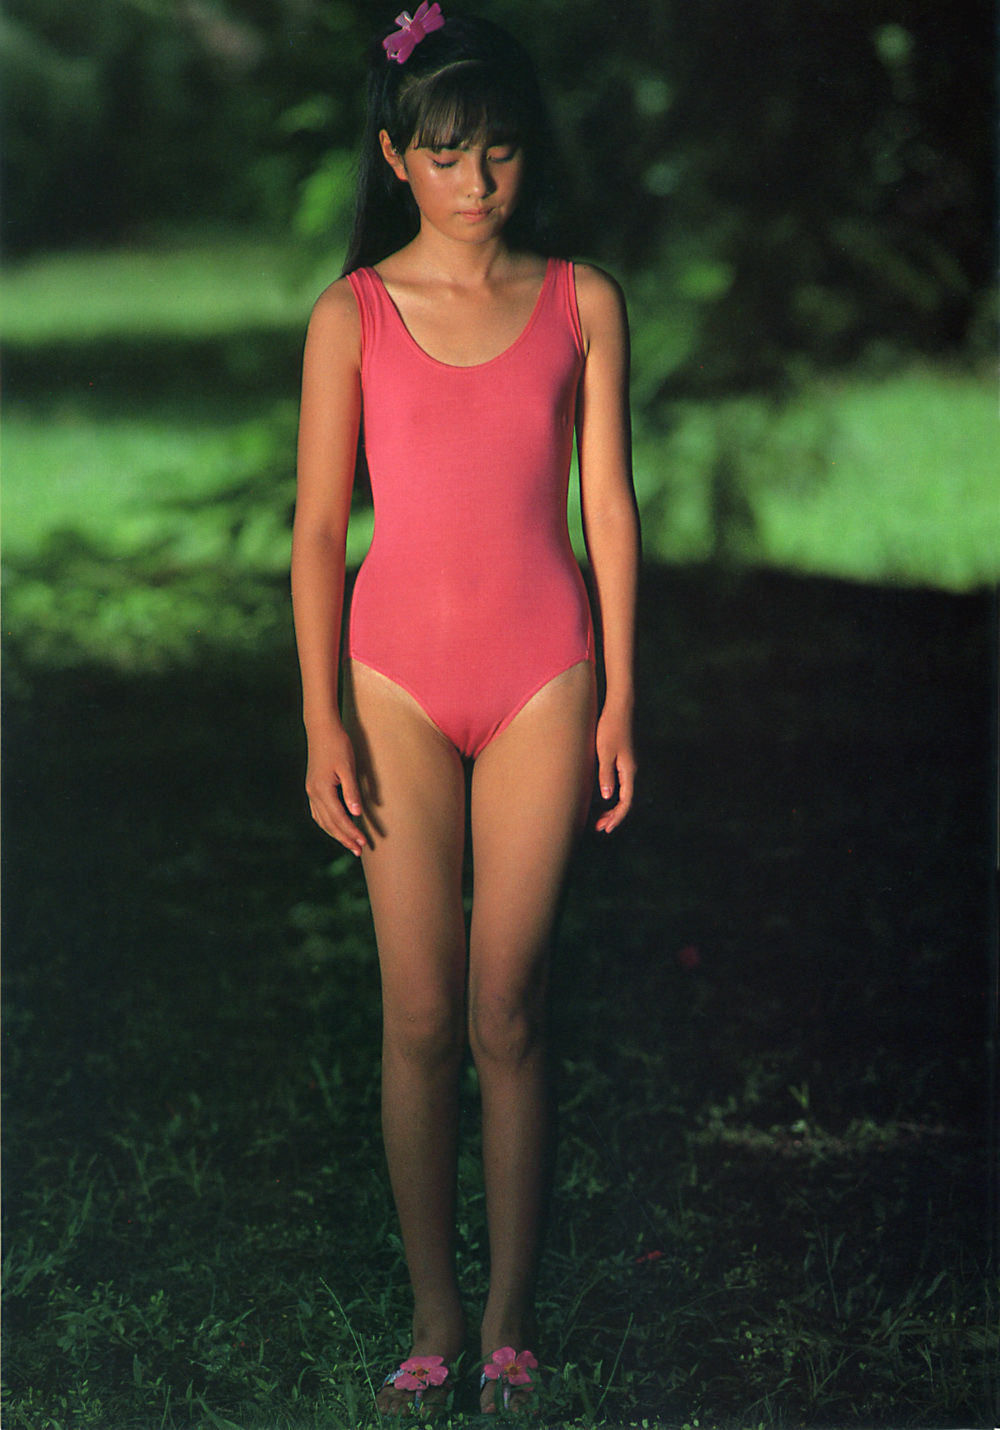 suwano shiori nude photo 12歳